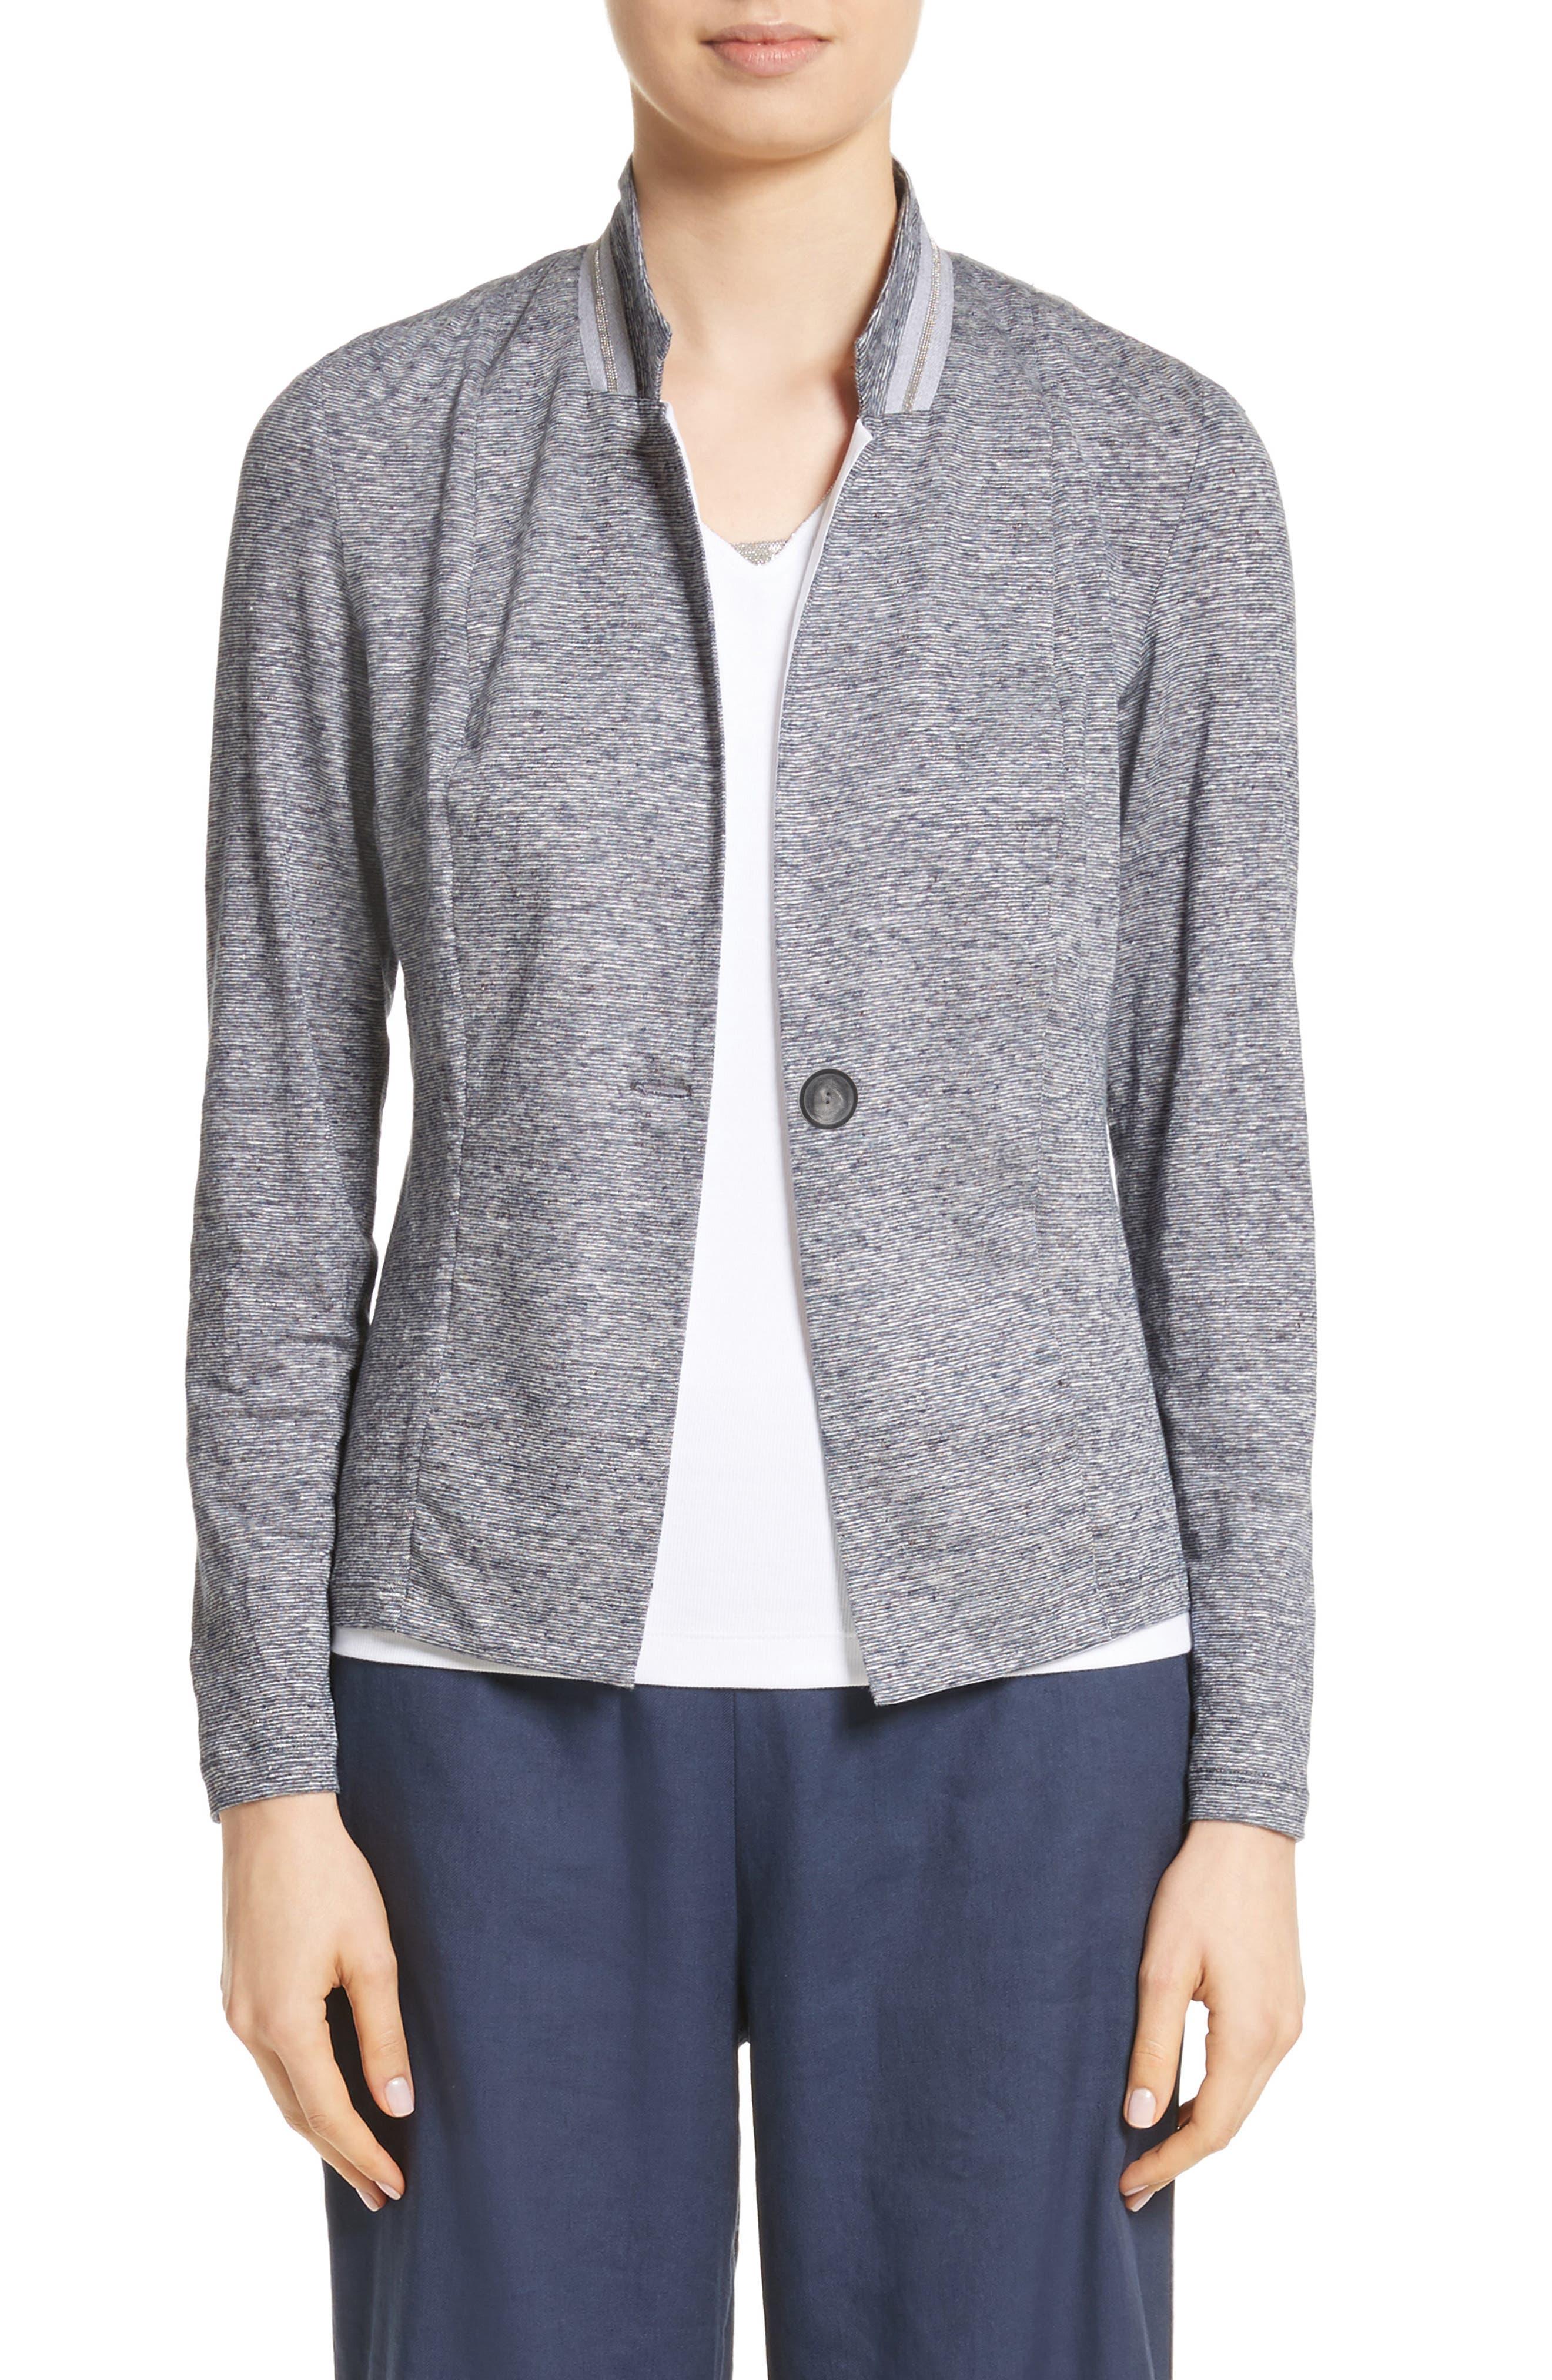 Grosgrain Stripe Jersey Jacket,                         Main,                         color, 400